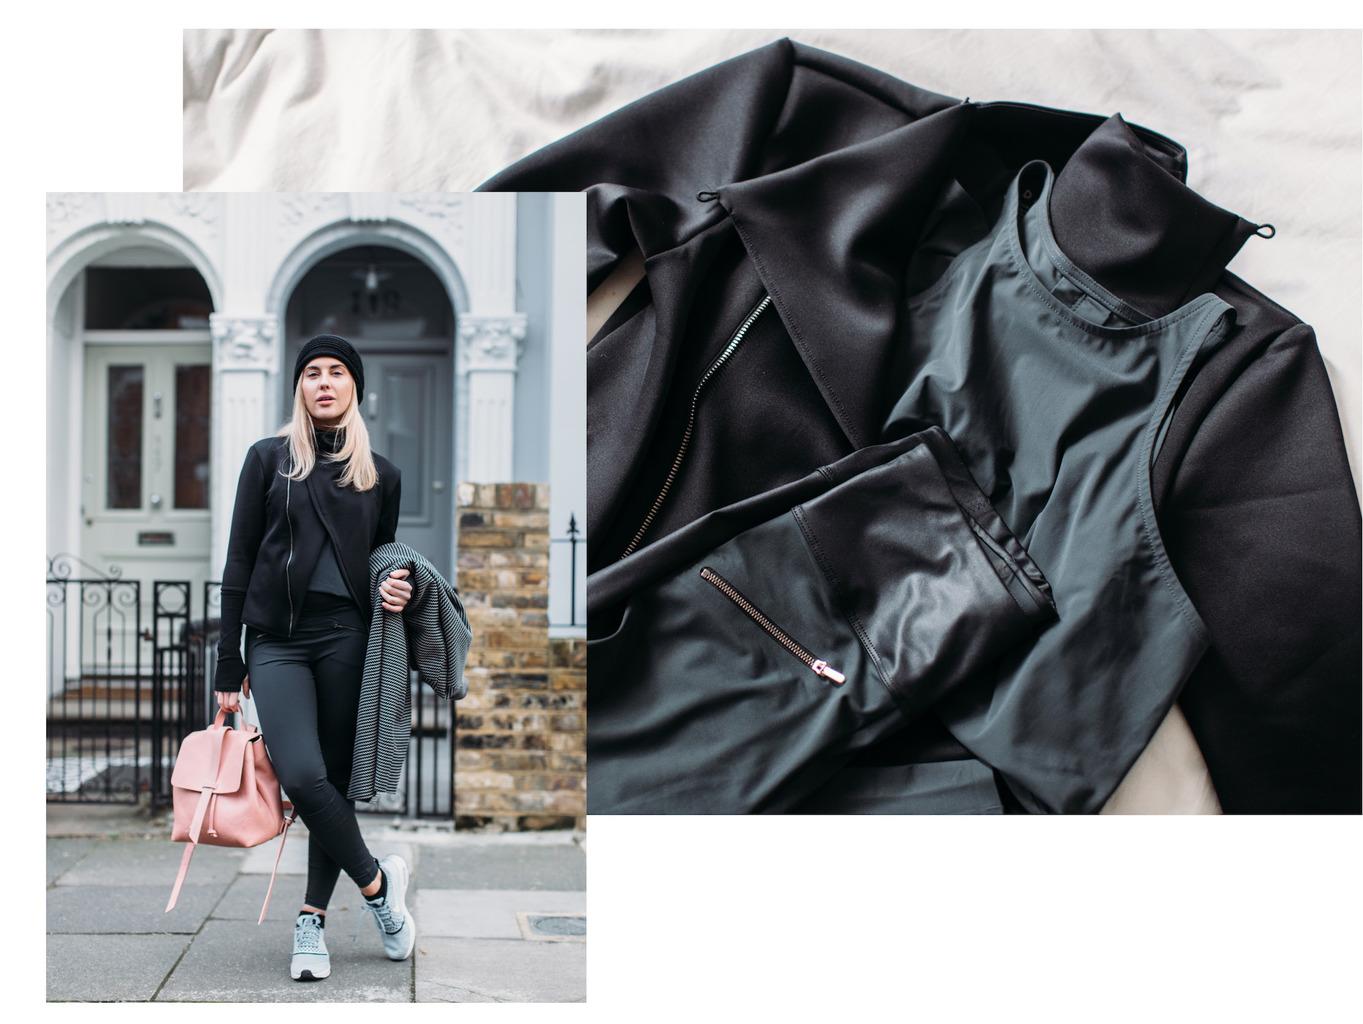 Leather jacket jigsaw - Leather Jacket Jigsaw 58